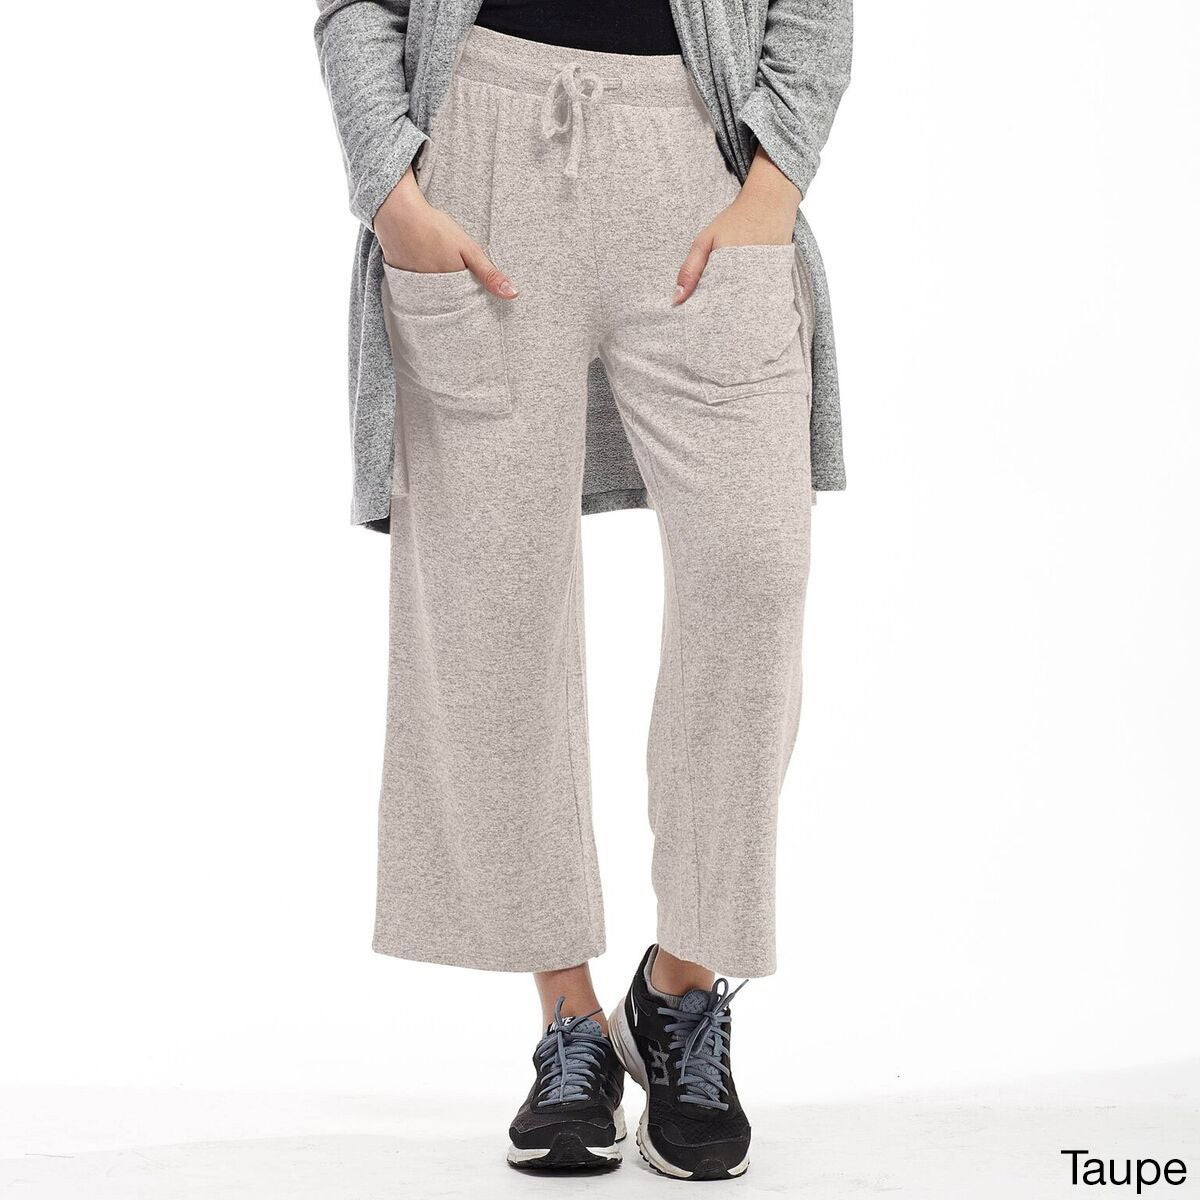 La Cera Women's Rayon/Polyester/Spandex Soft Capris (Medi...